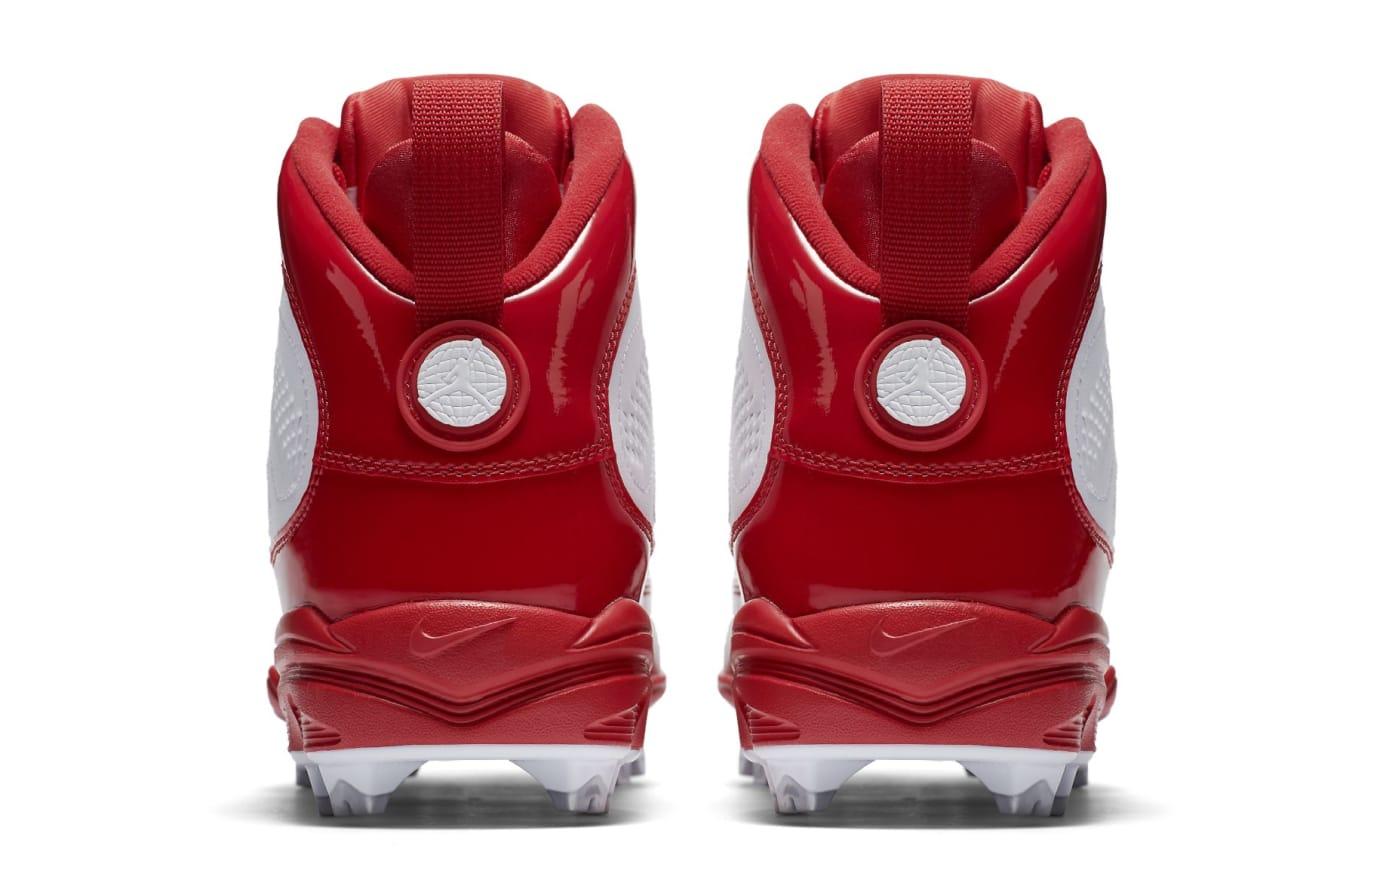 Air Jordan 9 IX MCS Baseball Cleats Red Heel